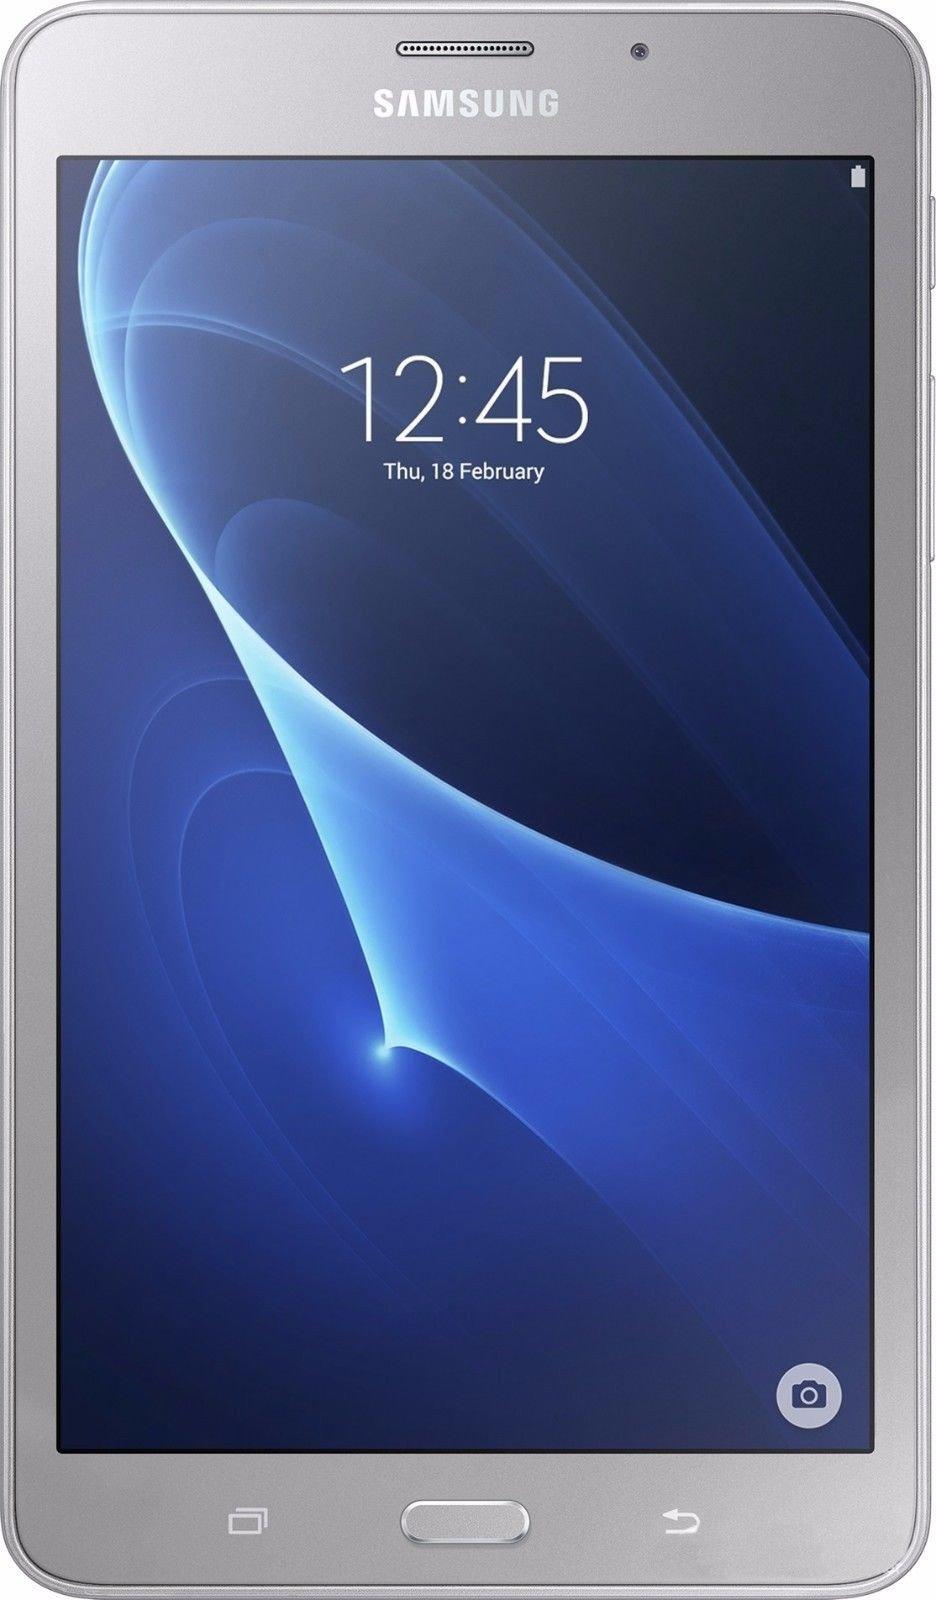 "Samsung Galaxy Tab A 7""(2016) T285 LTE 8GB Silver + FREE Samsung Tab A 7 Book Cover"